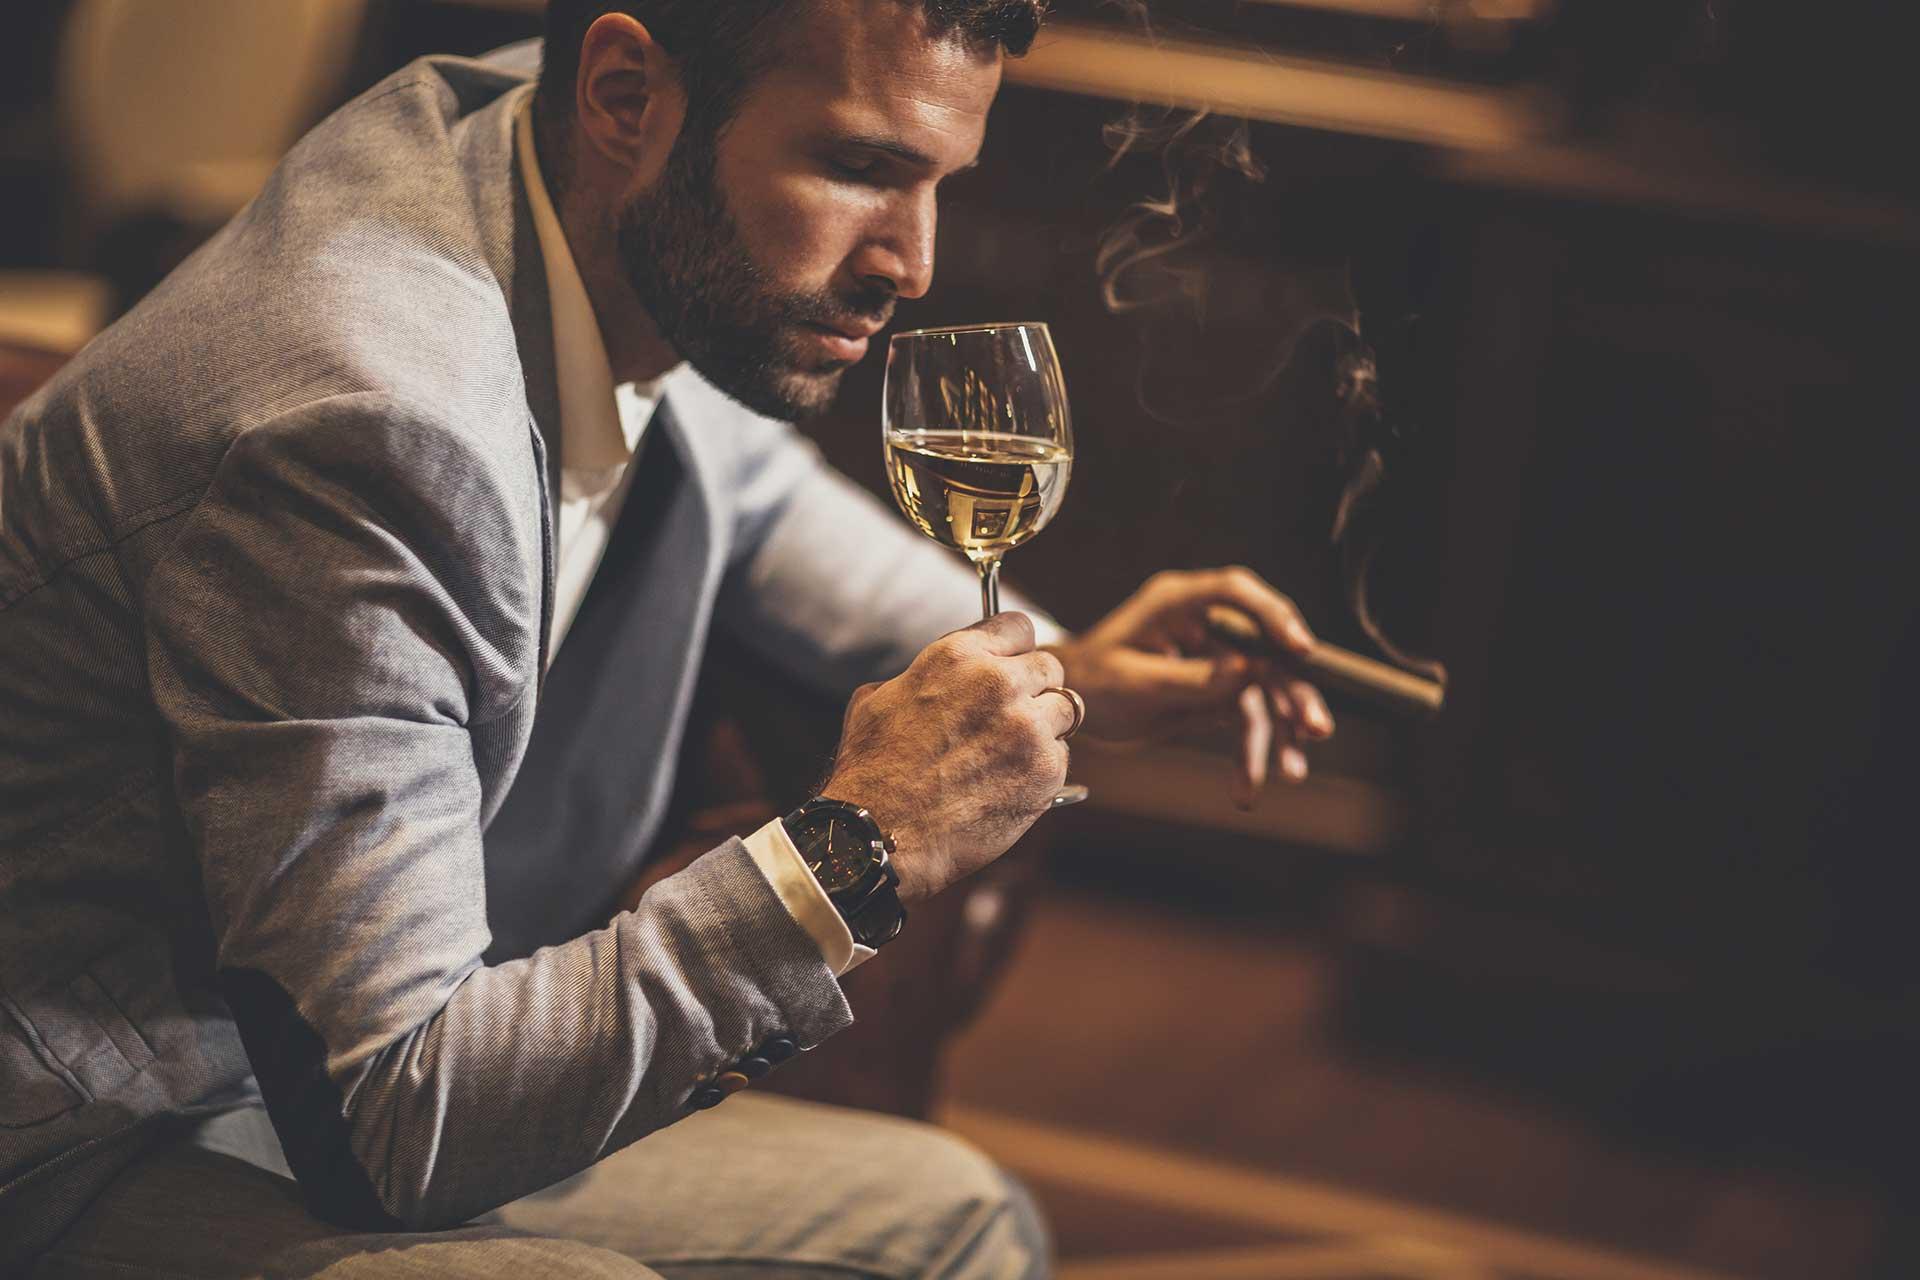 Man in strip club drinking wine and smoking cigar